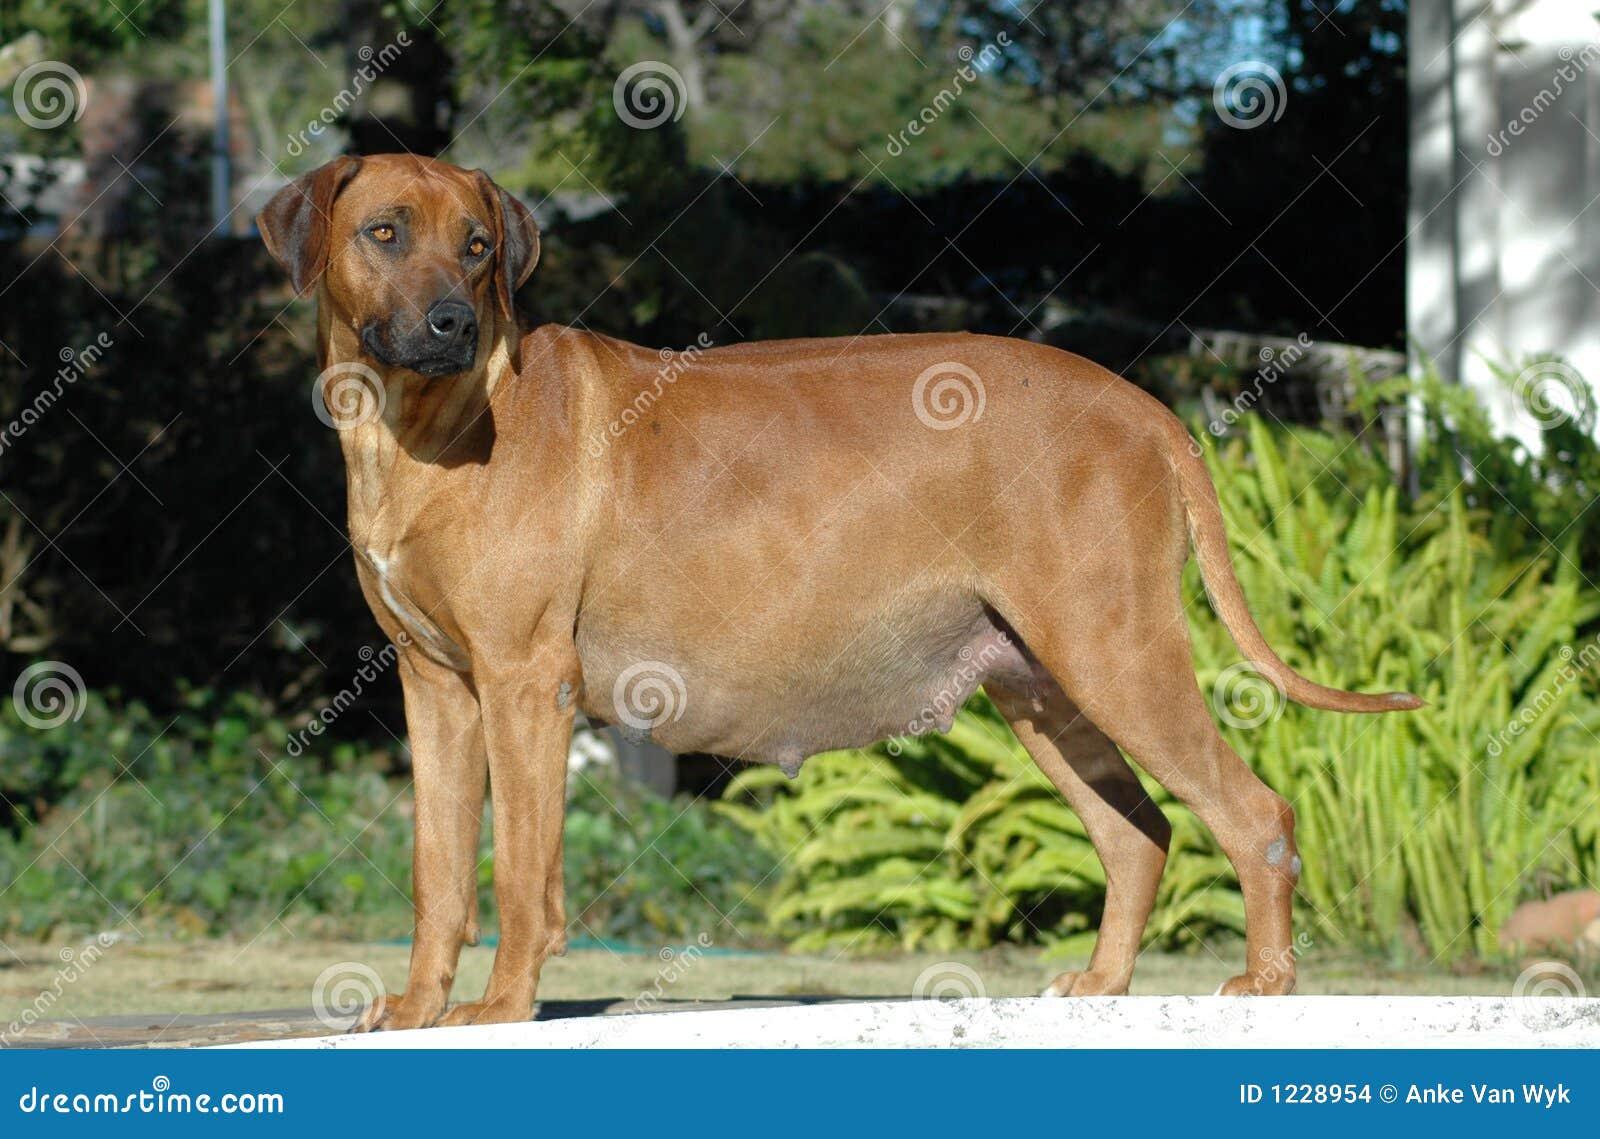 Dog pregnant